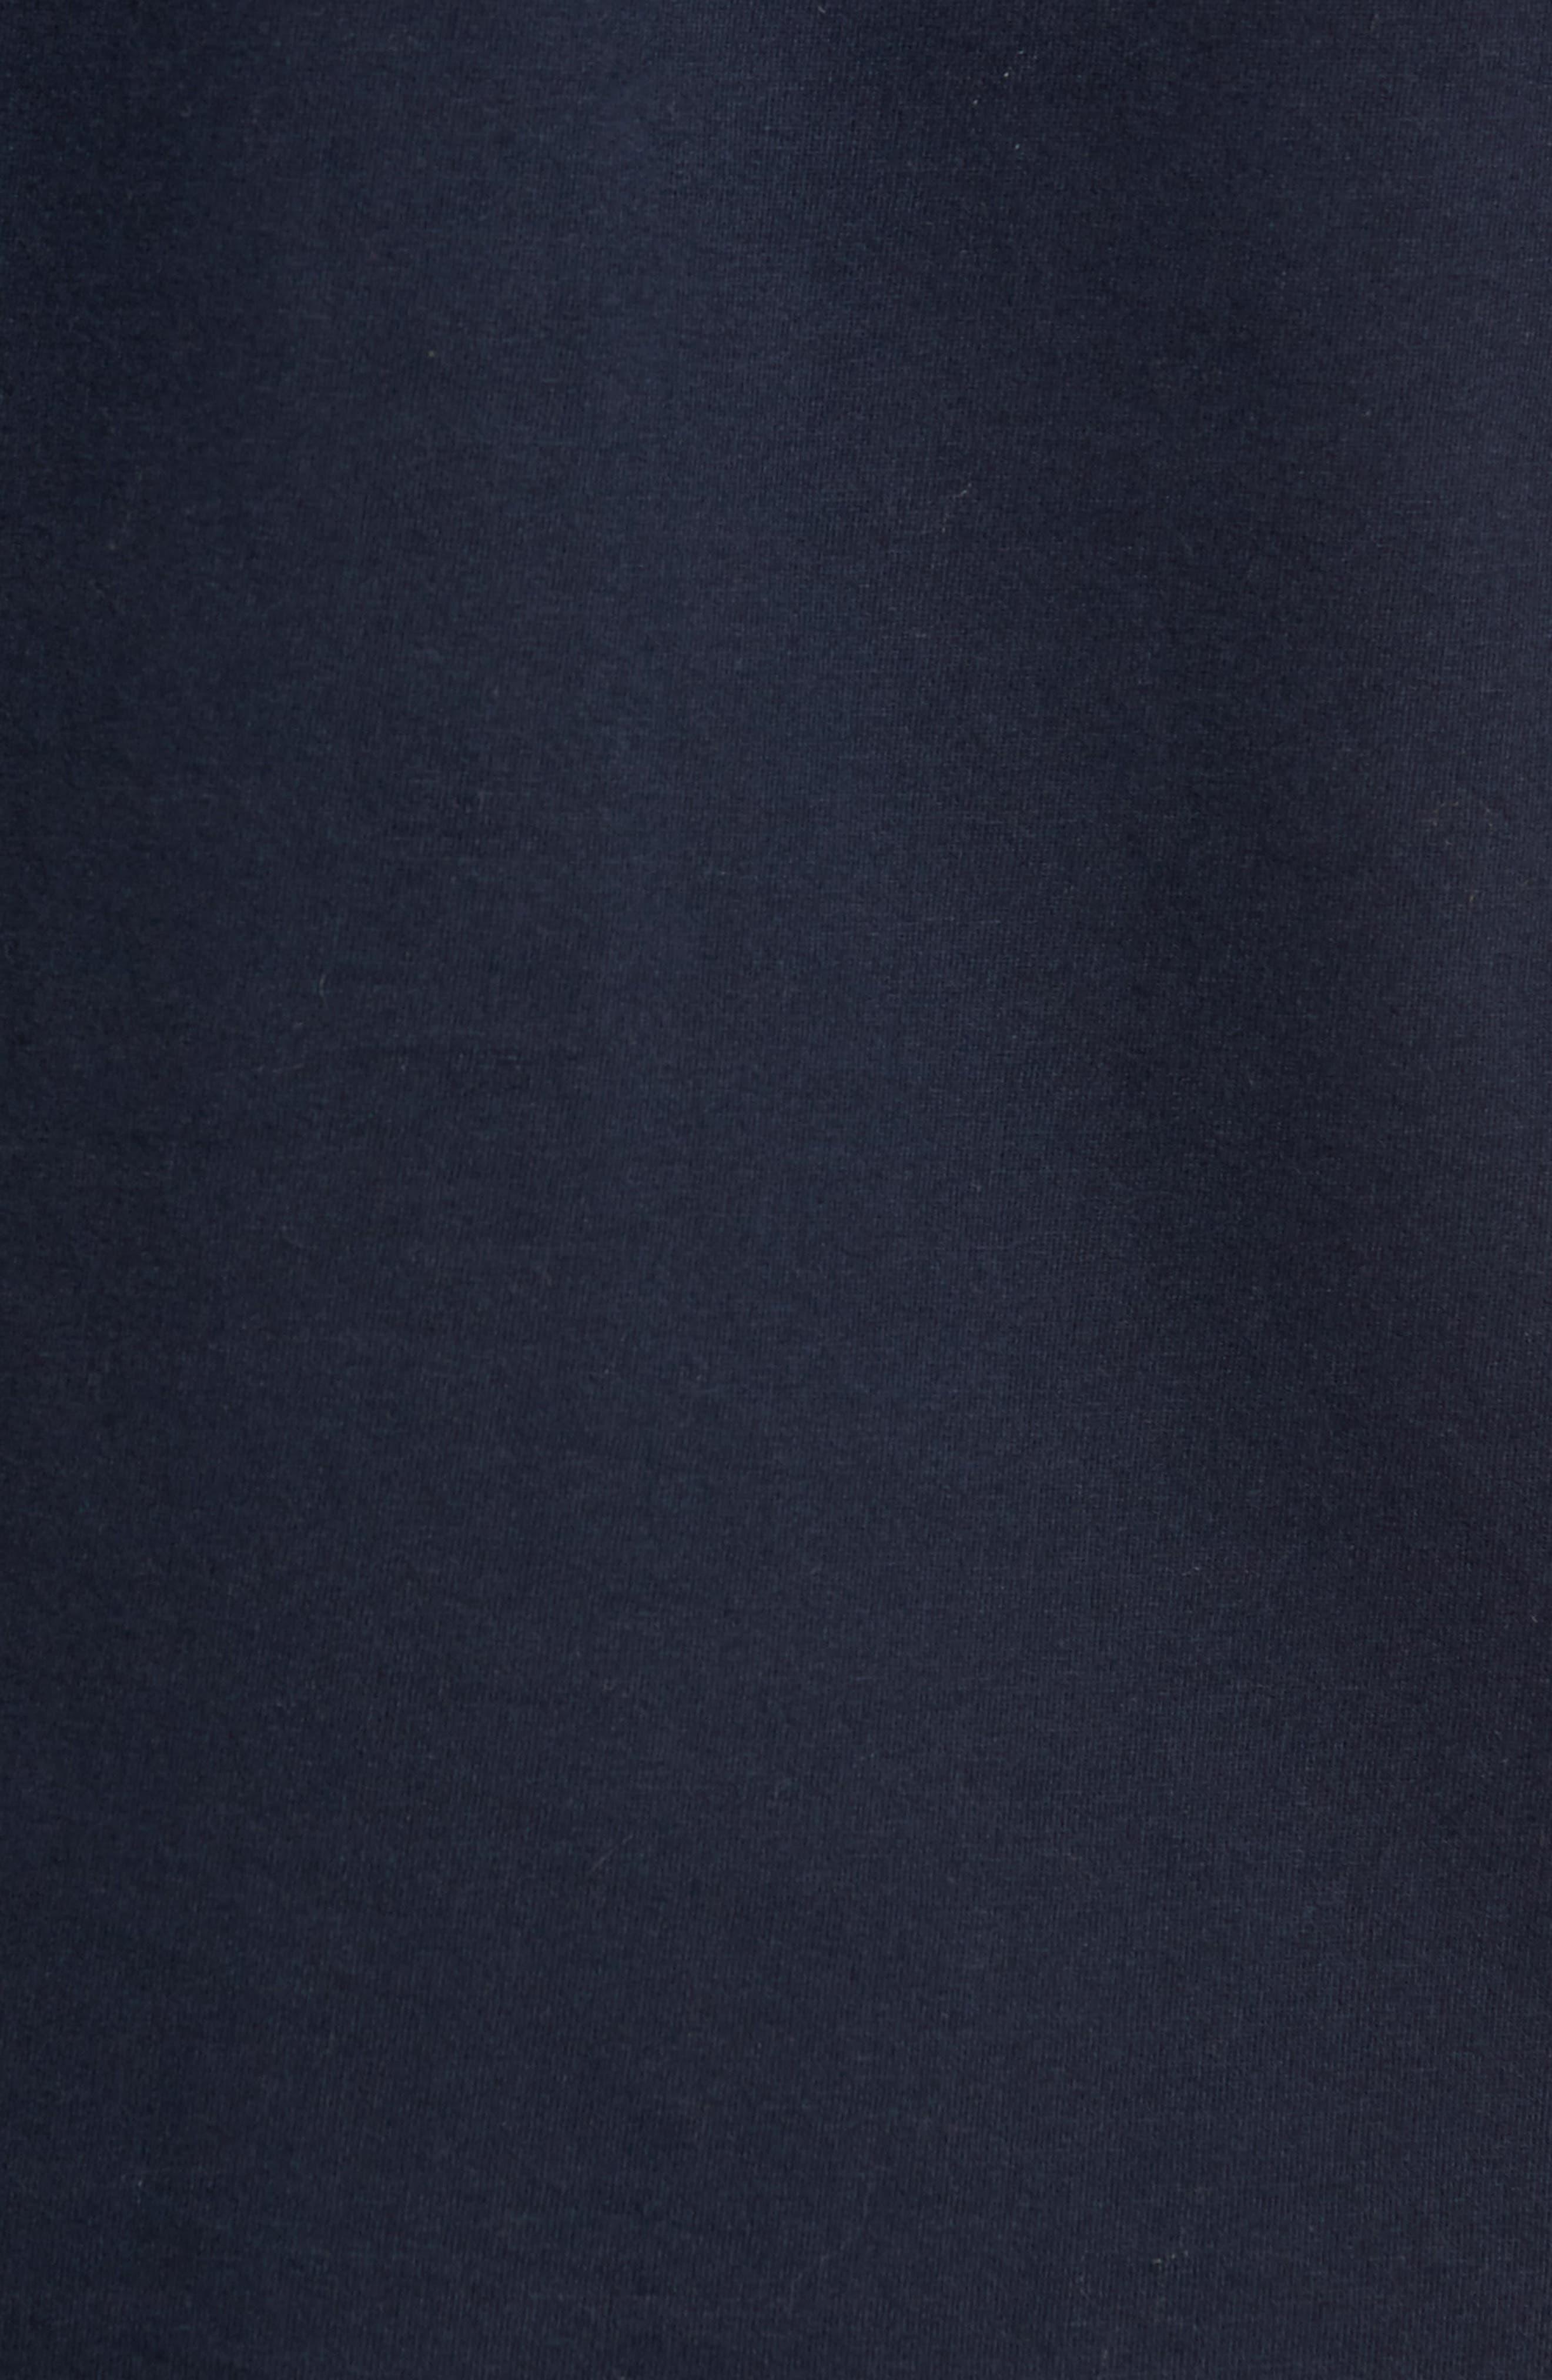 Bike Regular Fit T-Shirt,                             Alternate thumbnail 5, color,                             404